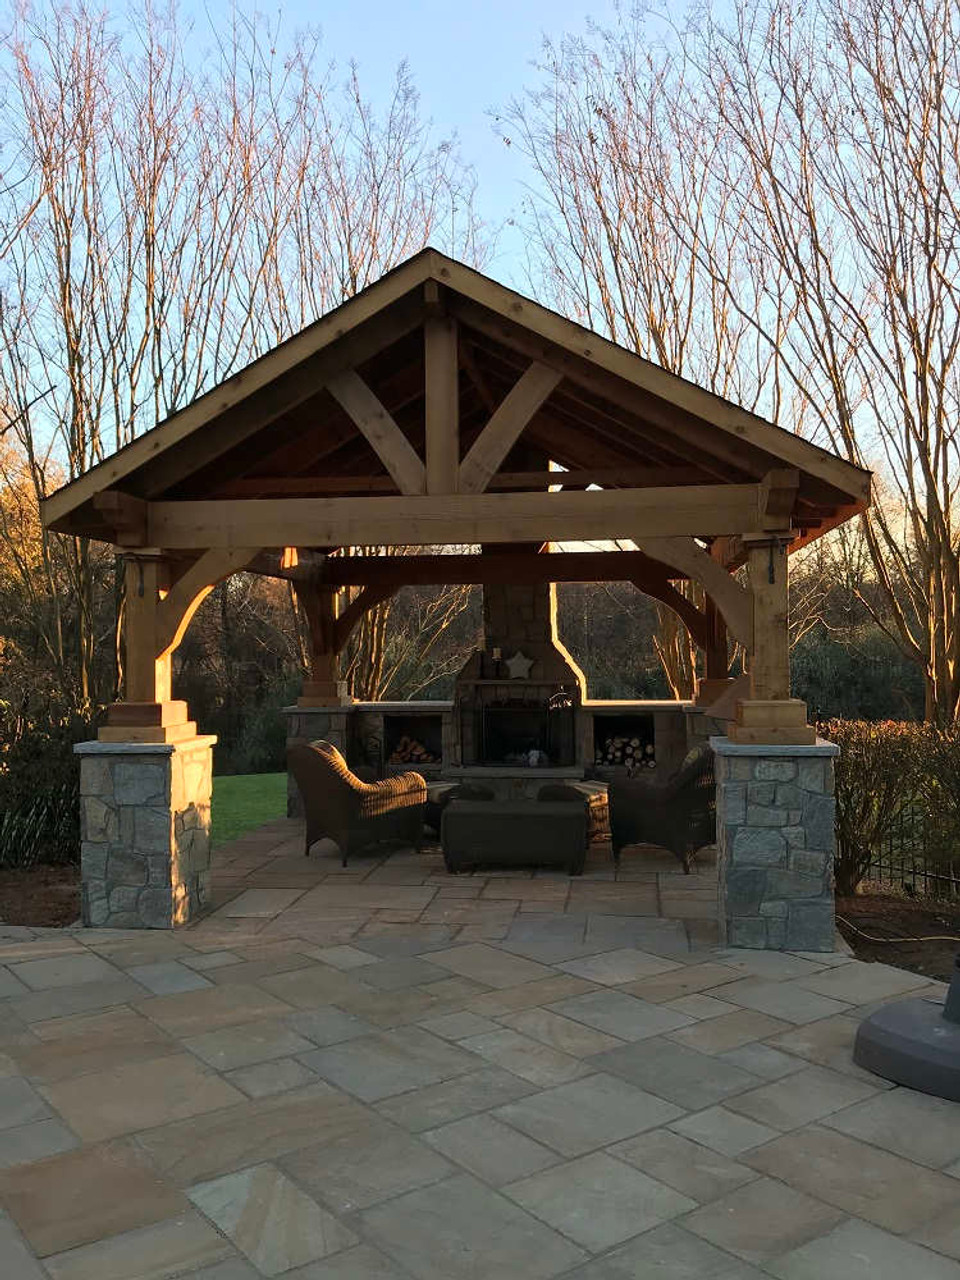 14x14 Grand Cedar Pavilion Kit, Silver Spring, MD